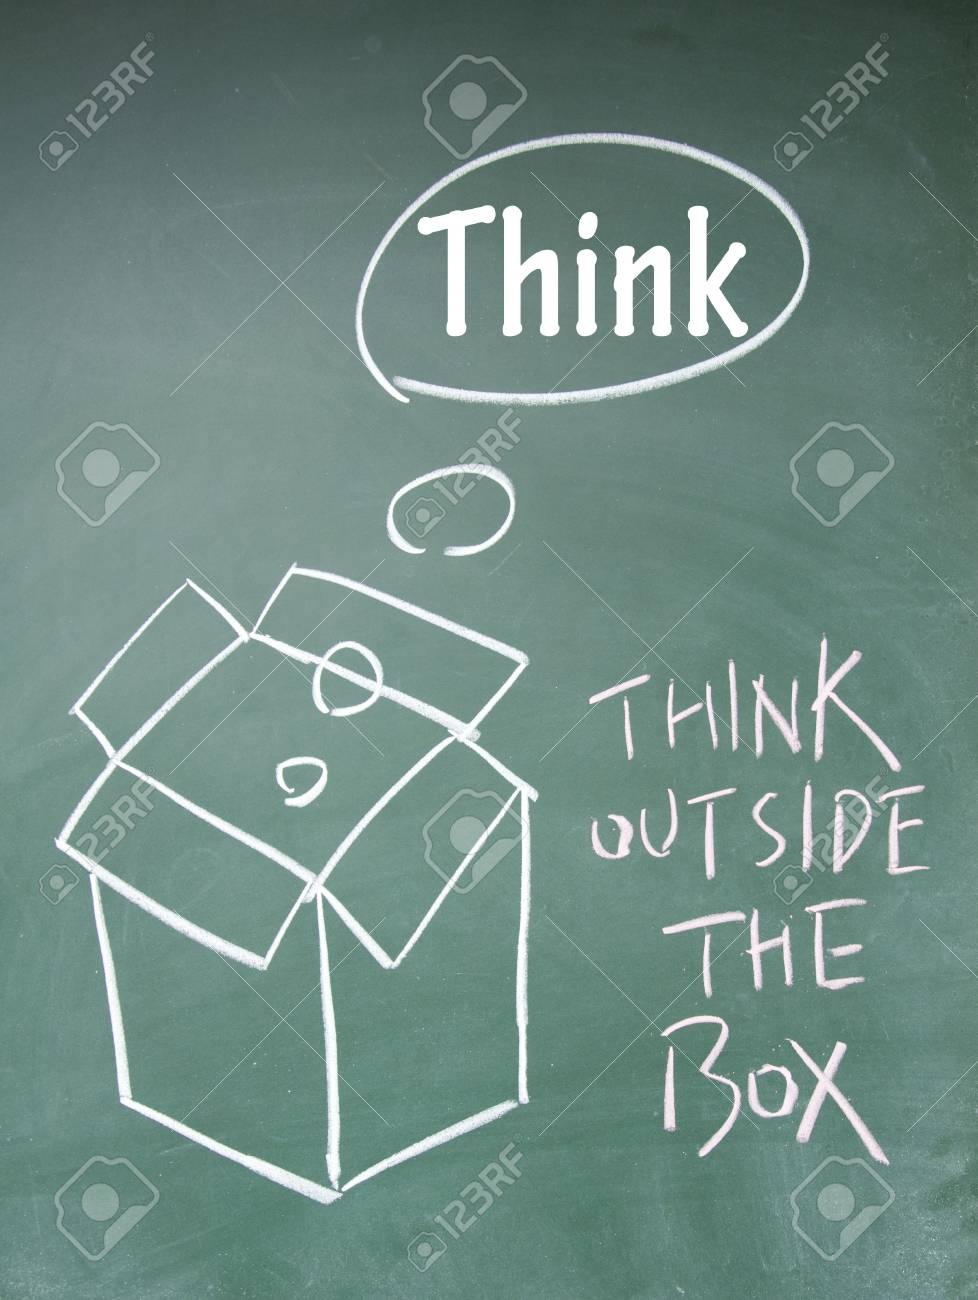 think outside the box symbol Stock Photo - 13851832